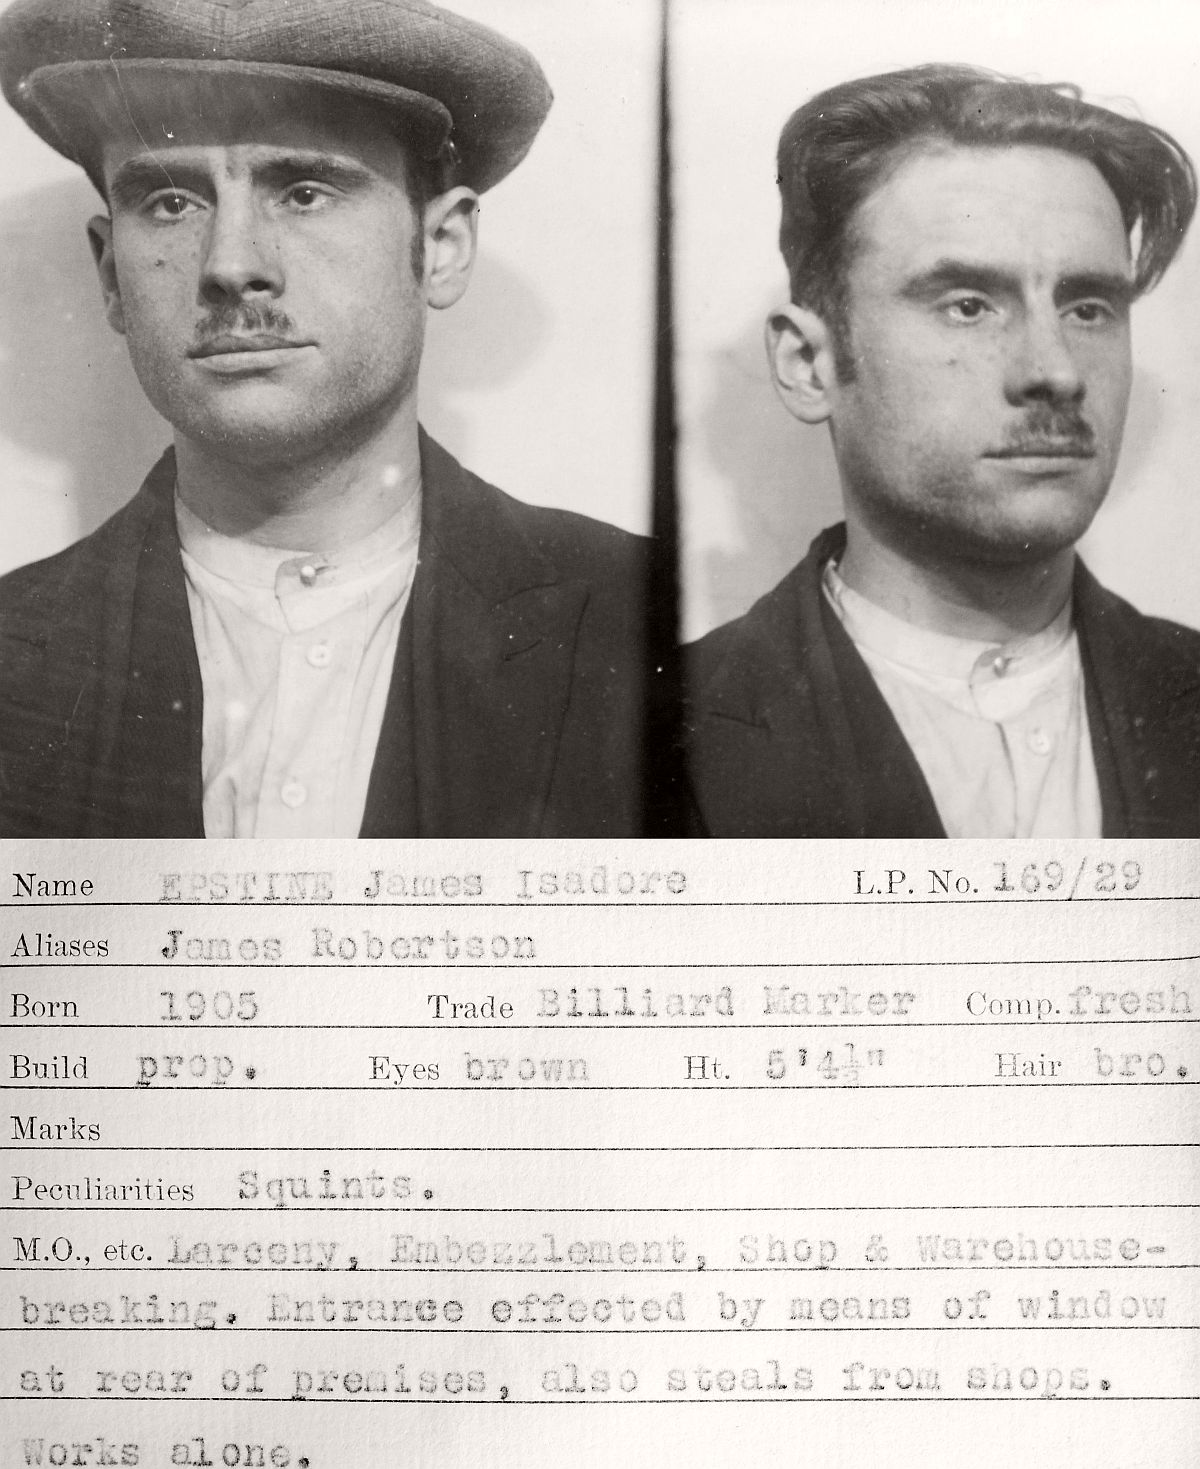 vintage-mug-shot-of-criminals-from-newcastle-upon-tyne-1930s-09